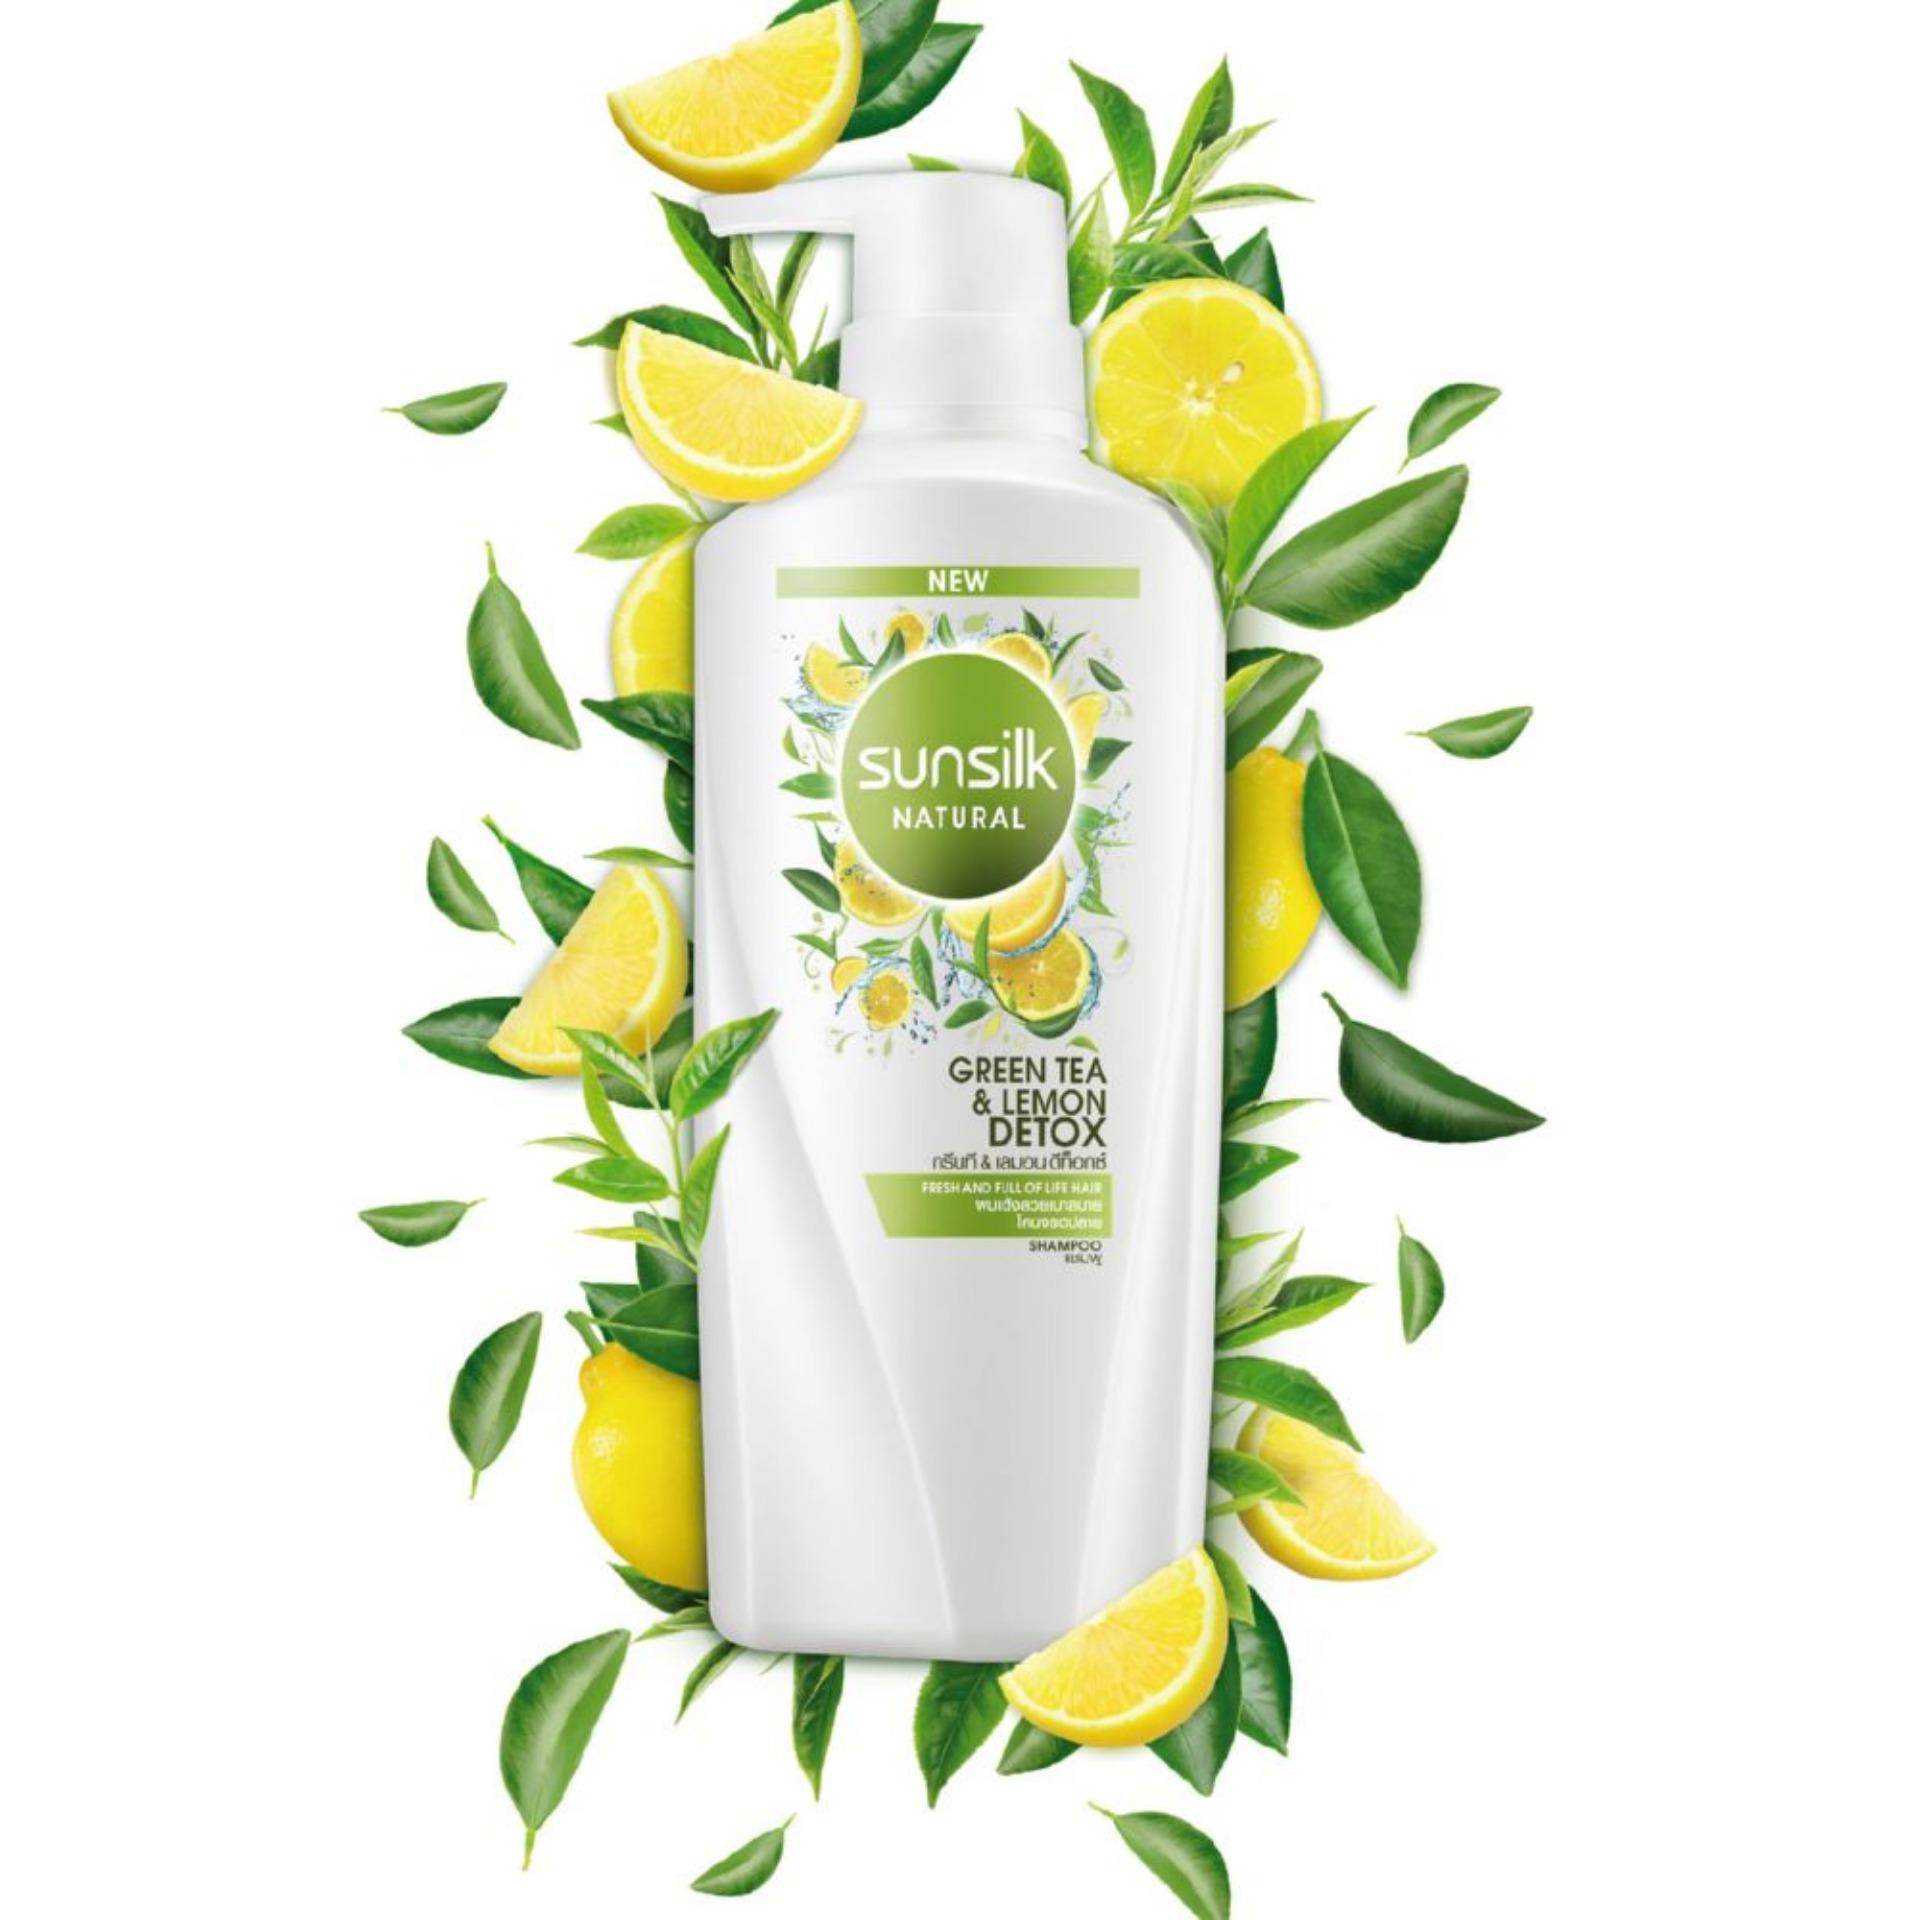 SUNSILK Natural Green Tea & Lemon Detox Shampoo (450ML)